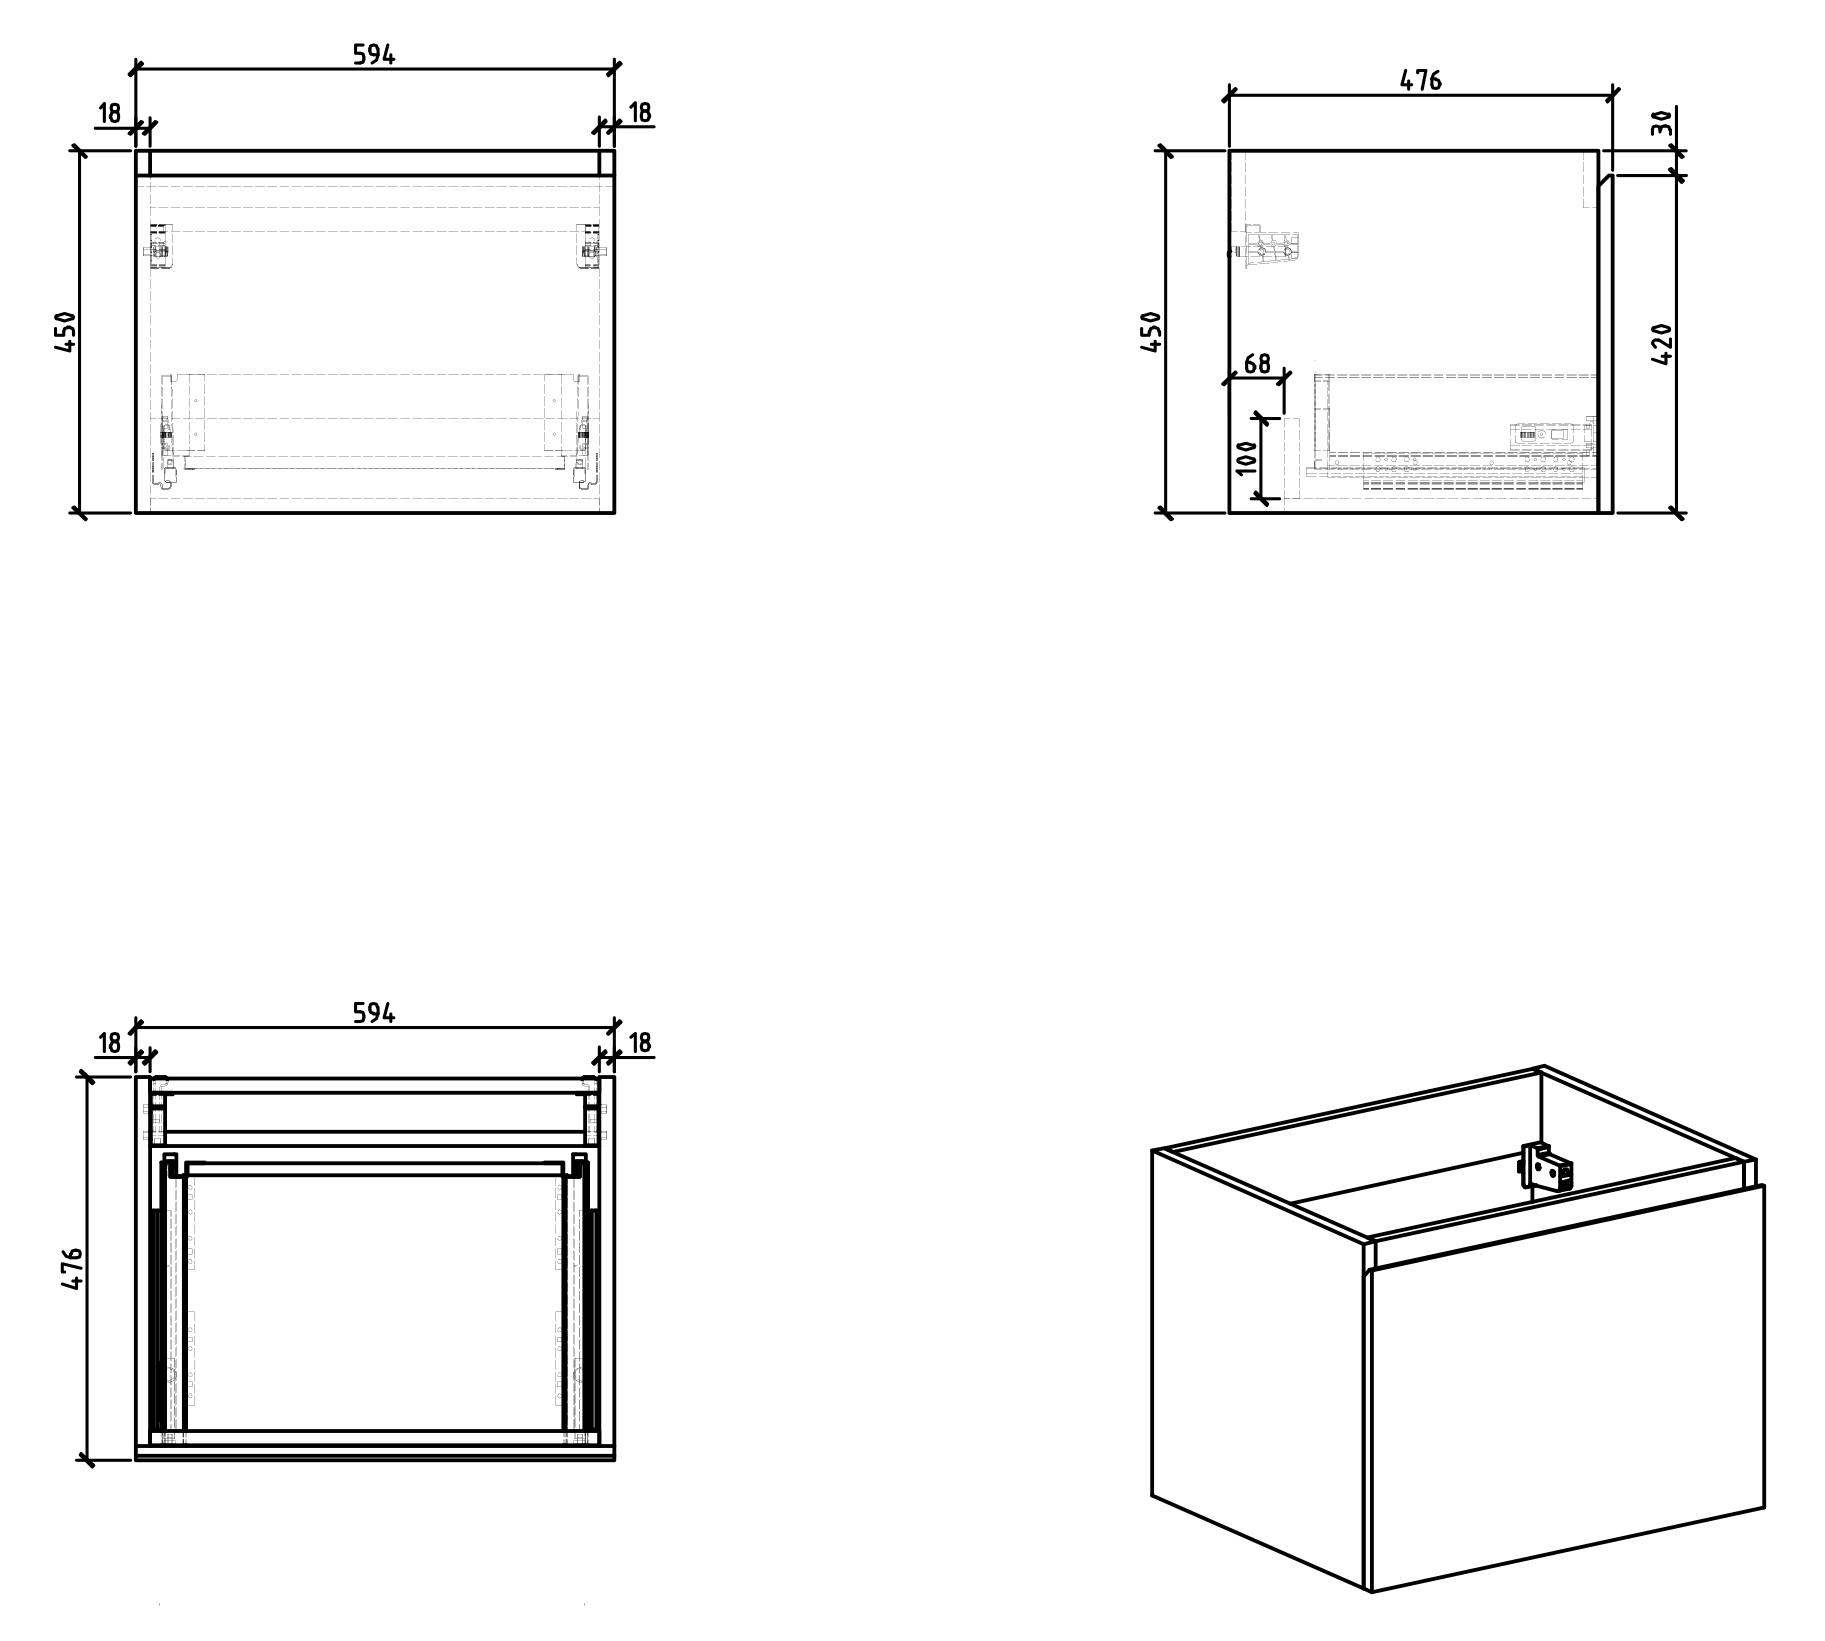 Bathroom furniture set Alice 600 - Drawing